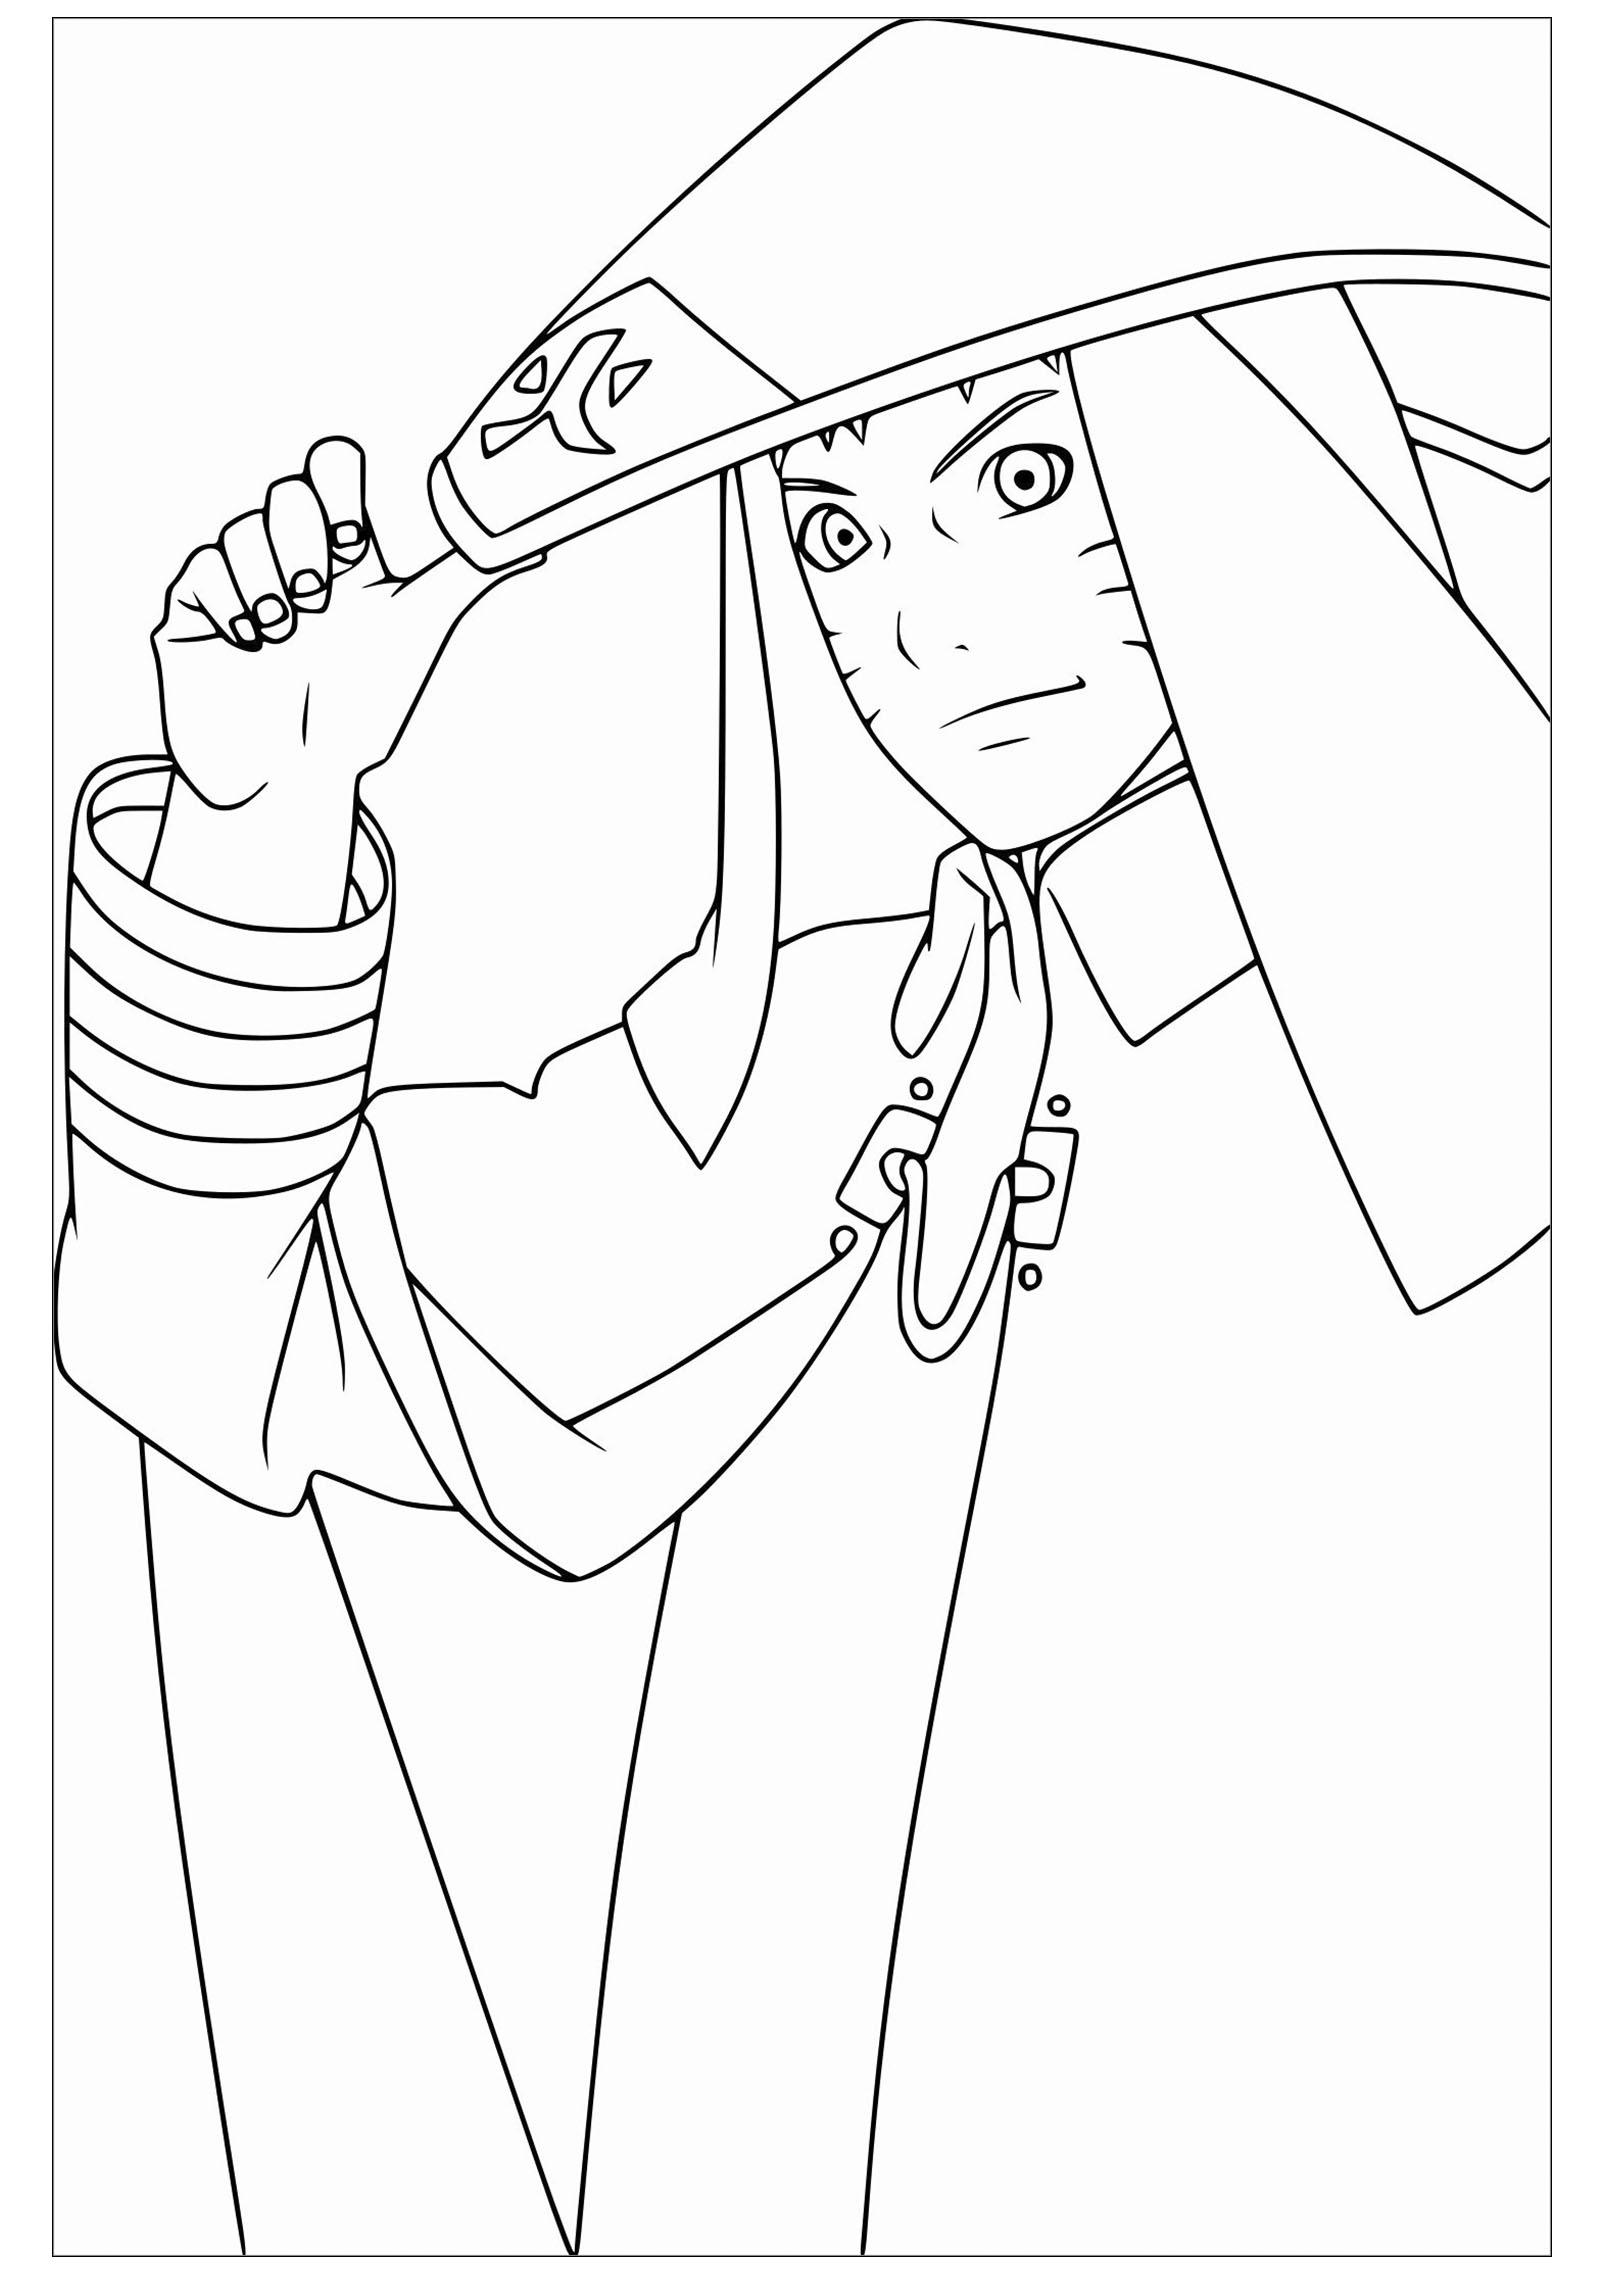 Naruto - Coloriage Naruto - Coloriages pour enfants